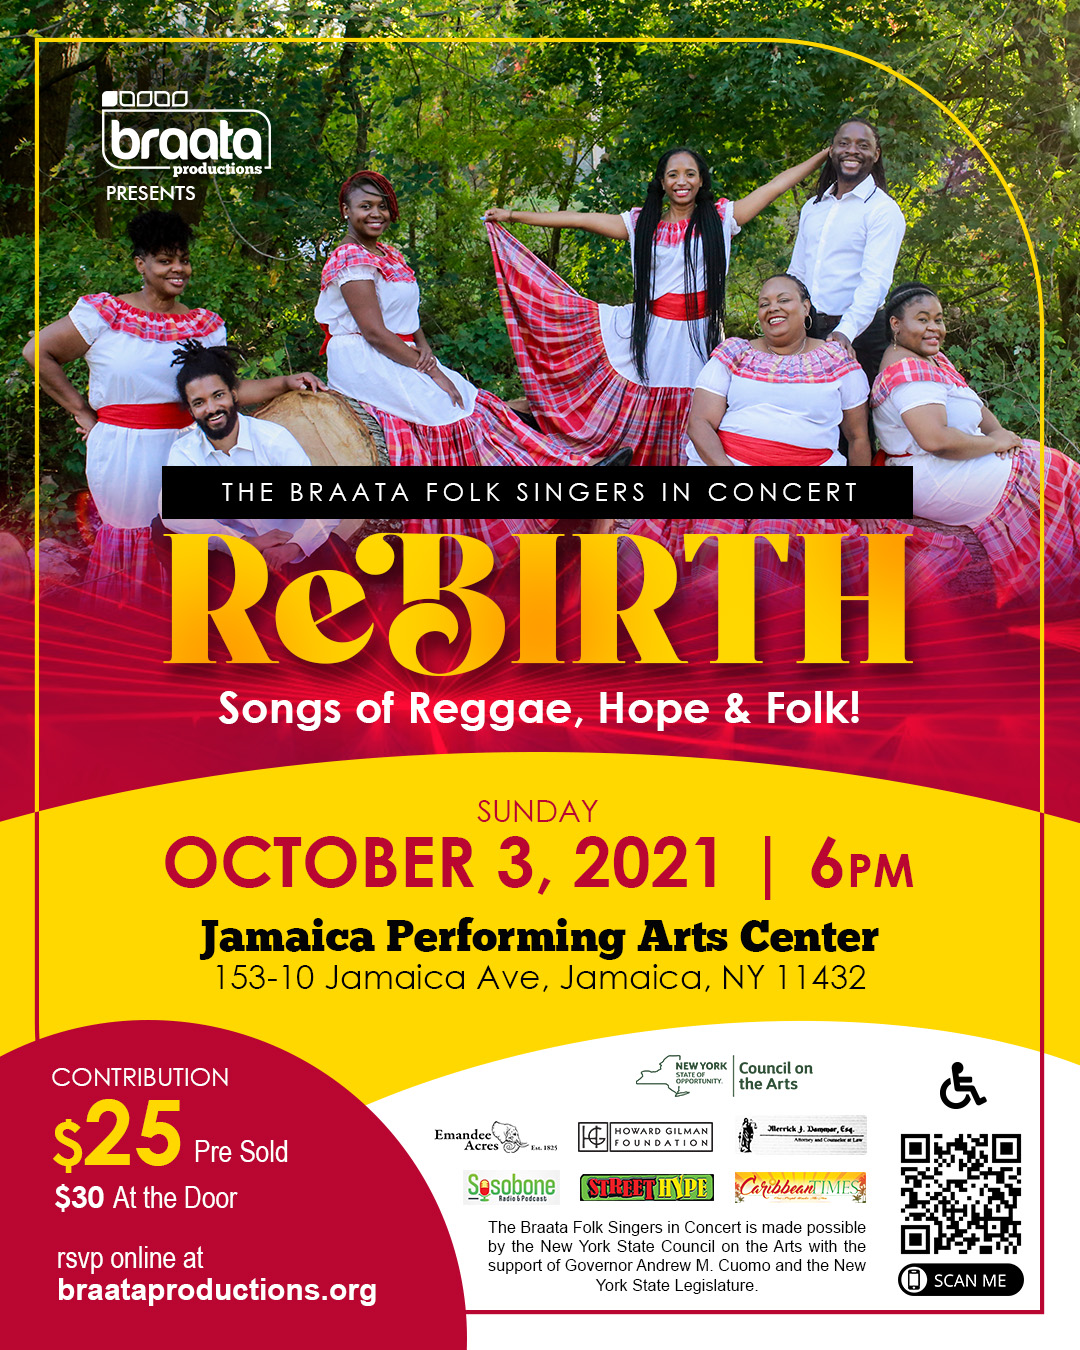 Braata Folk Singers in Concert: Rebirth at Jamaica Performing Arts Center (JPAC)